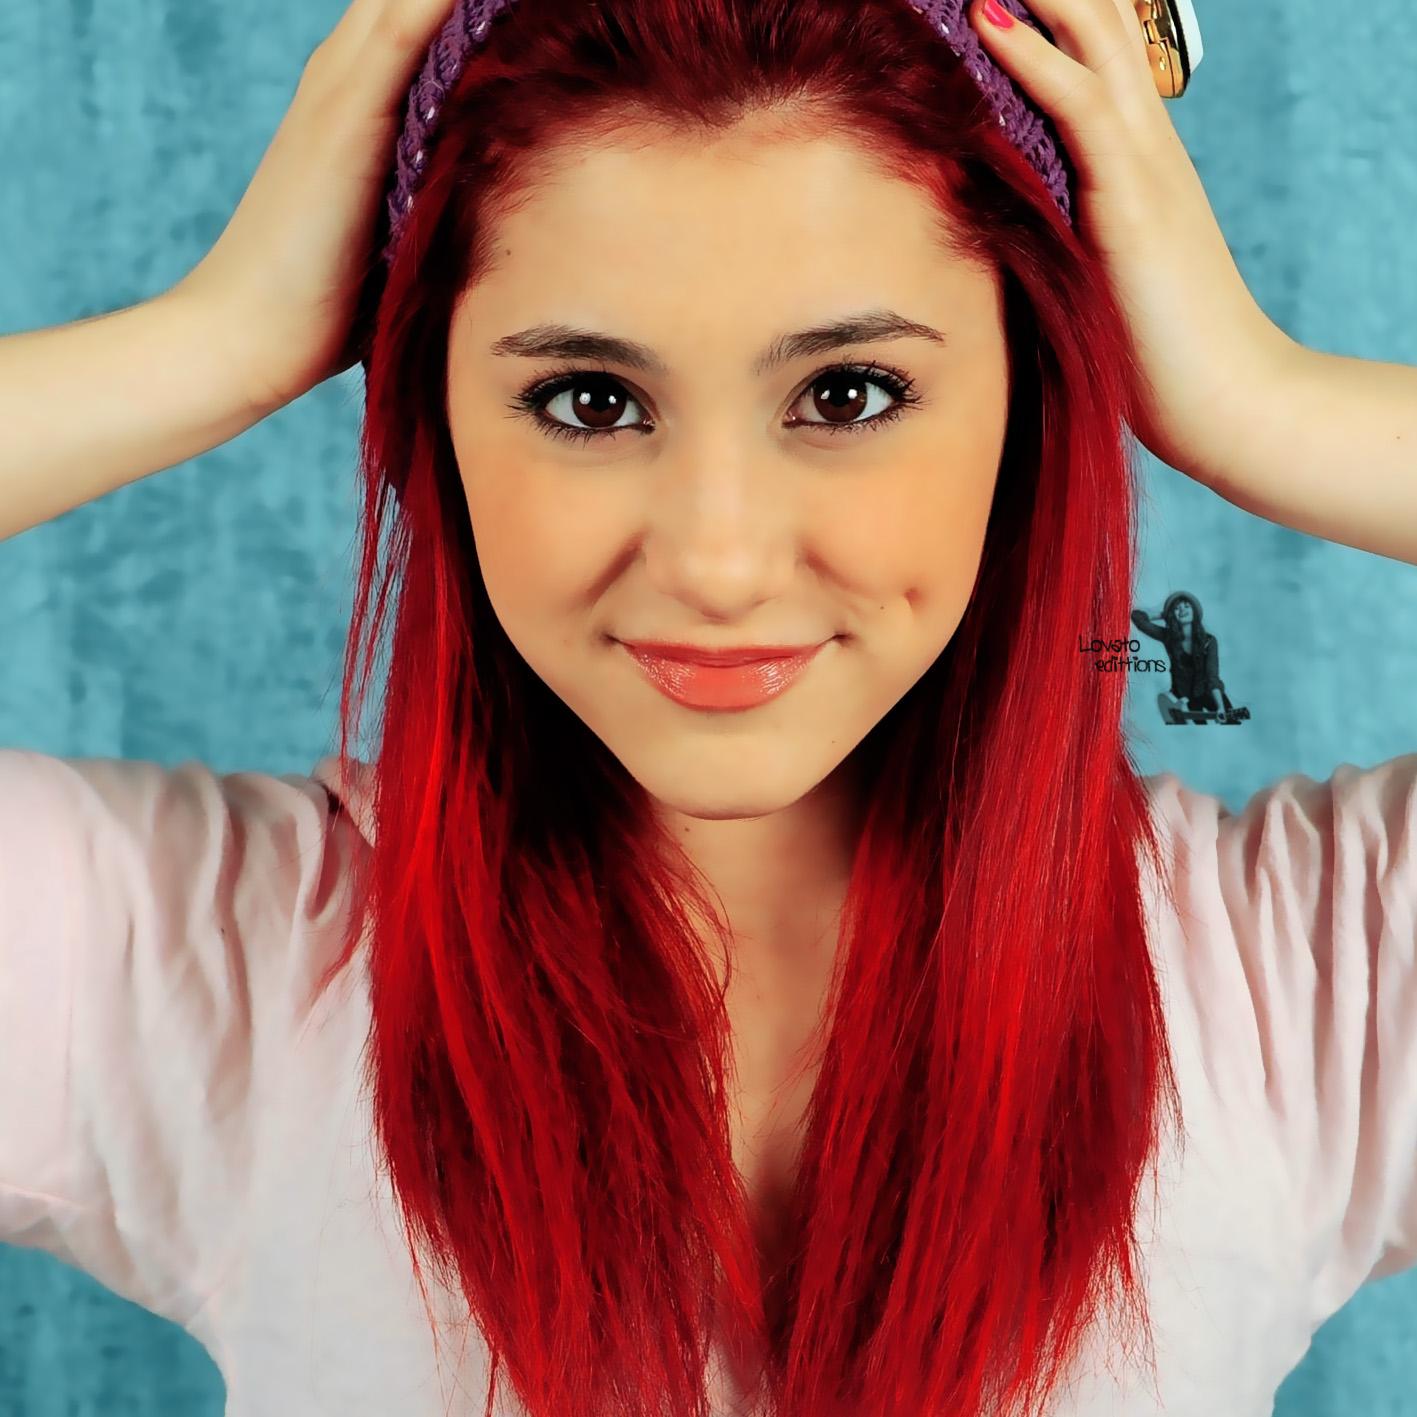 Image Ariana Grande Red Hairg Sam And Cat Wiki Fandom